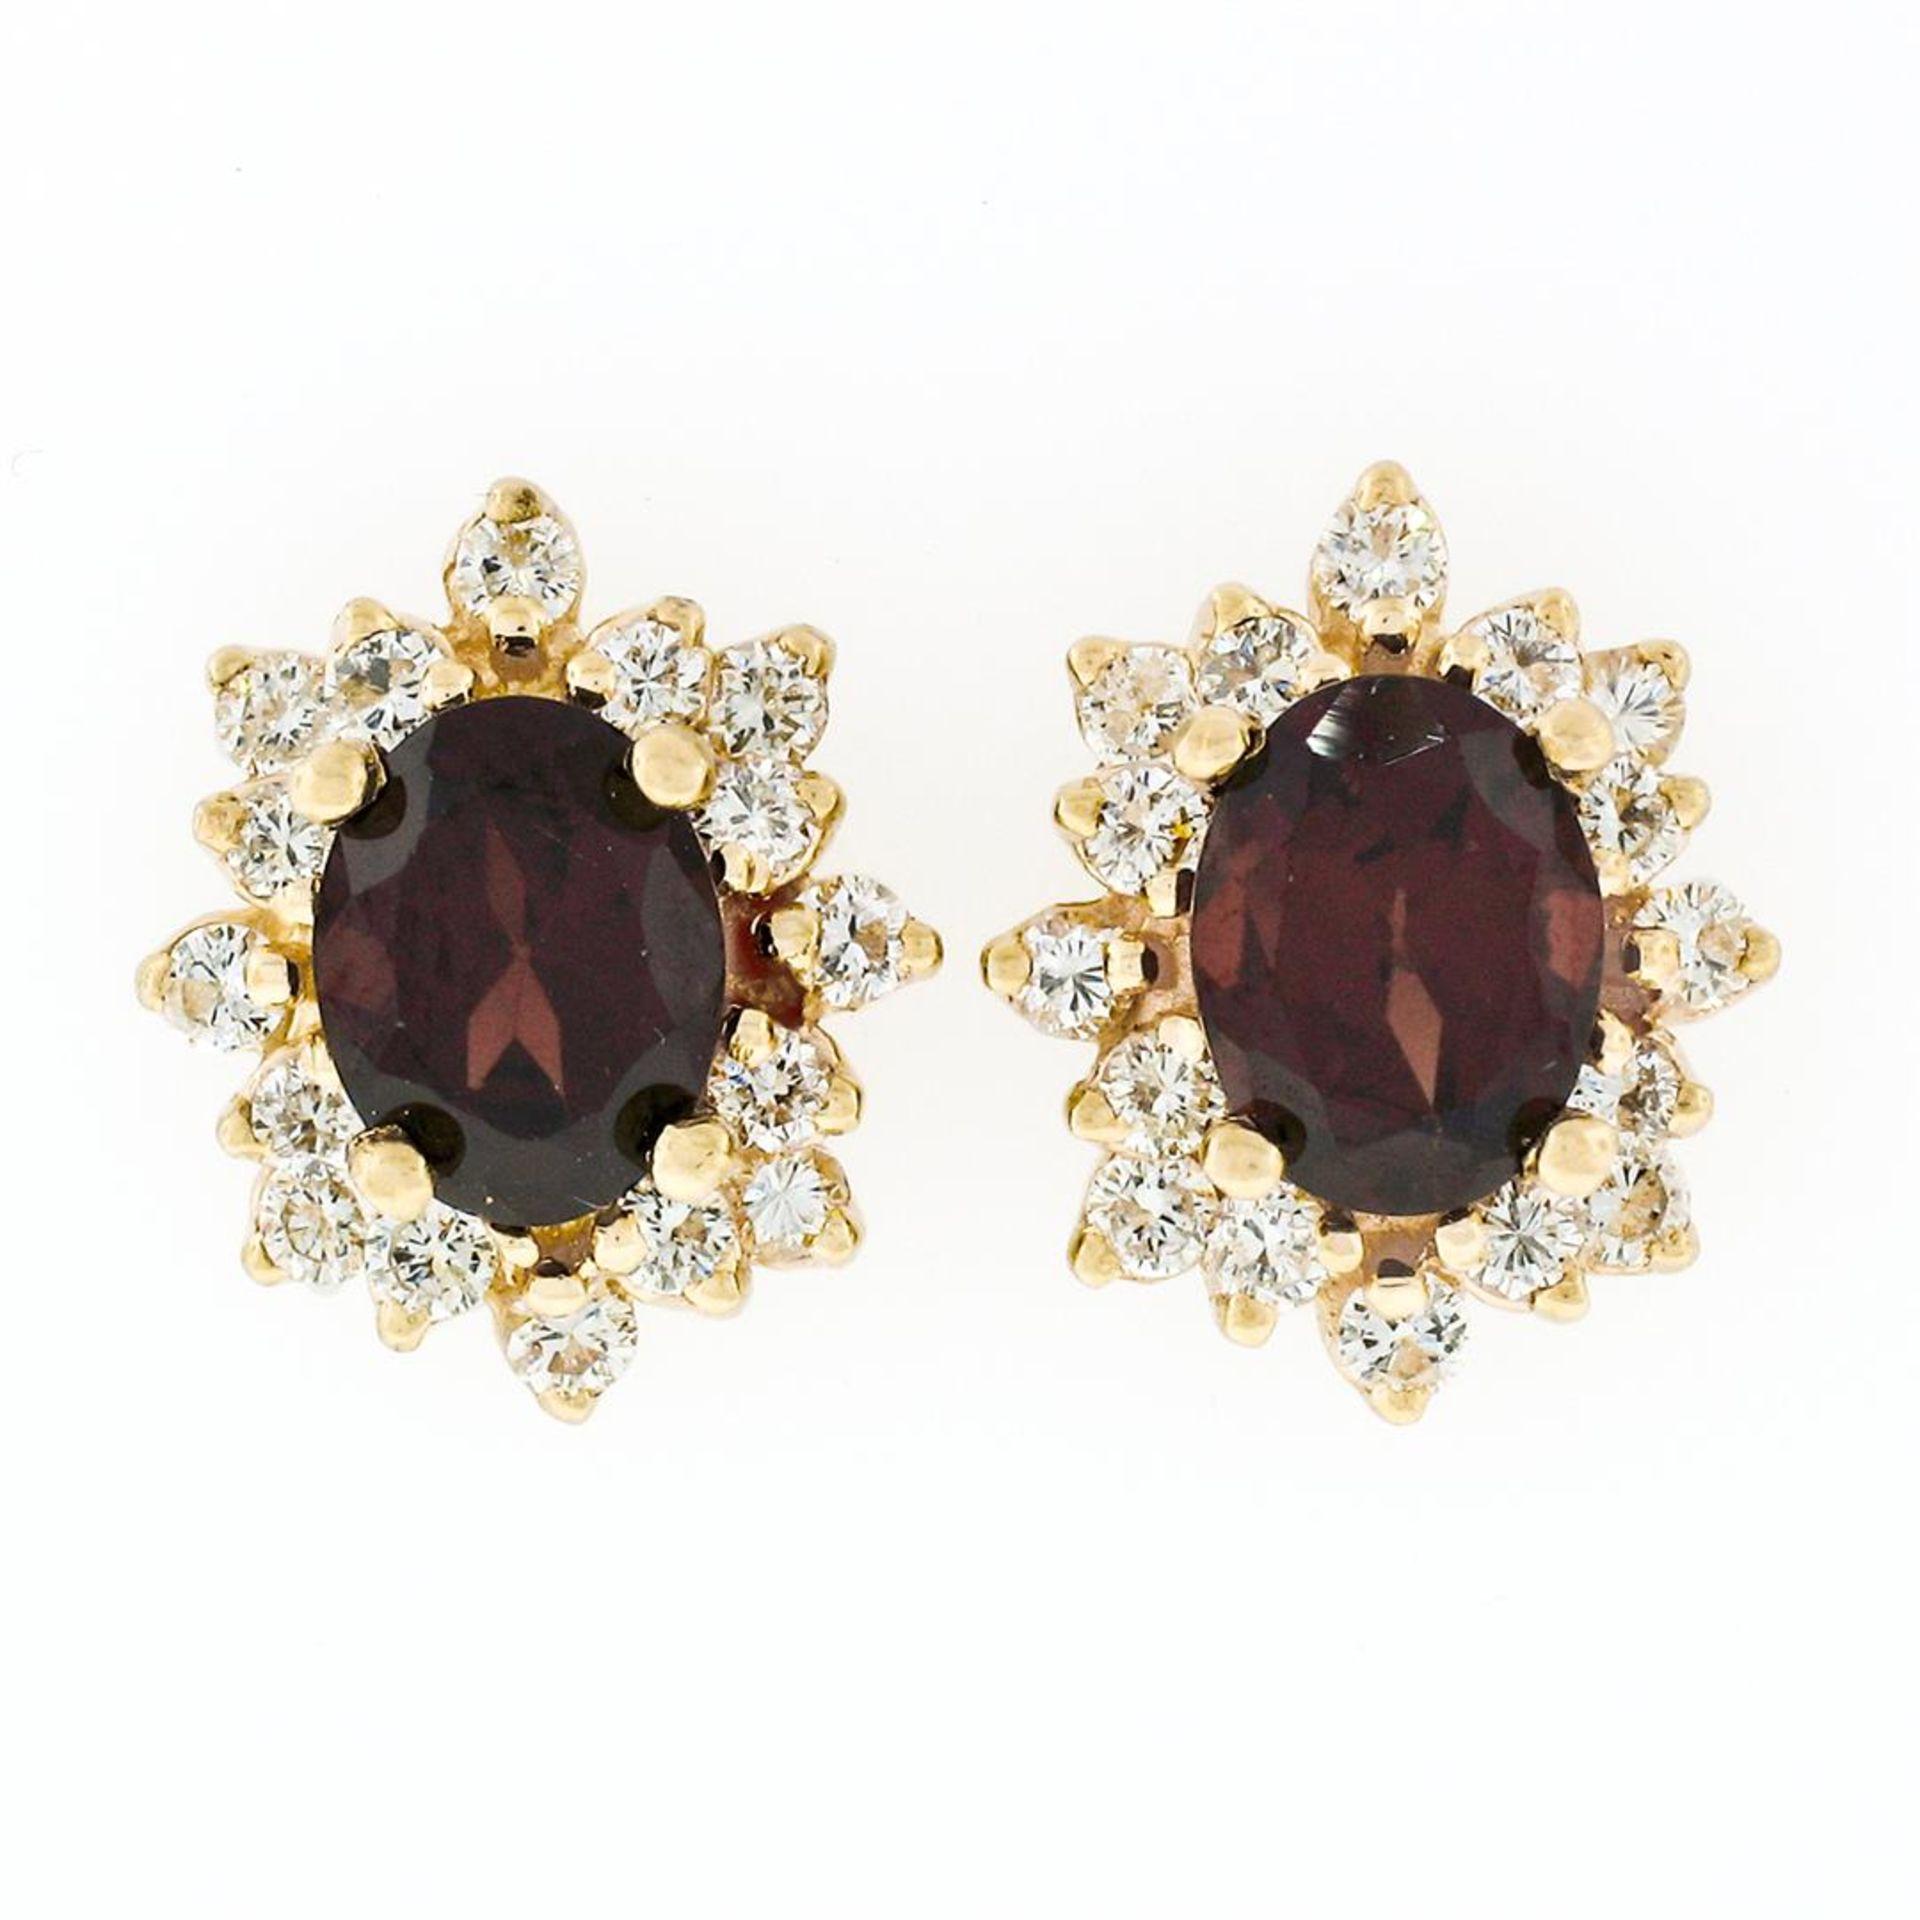 14k Yellow Gold 3.80ctw Oval Garnet & Layered Round Diamond Halo Stud Earrings